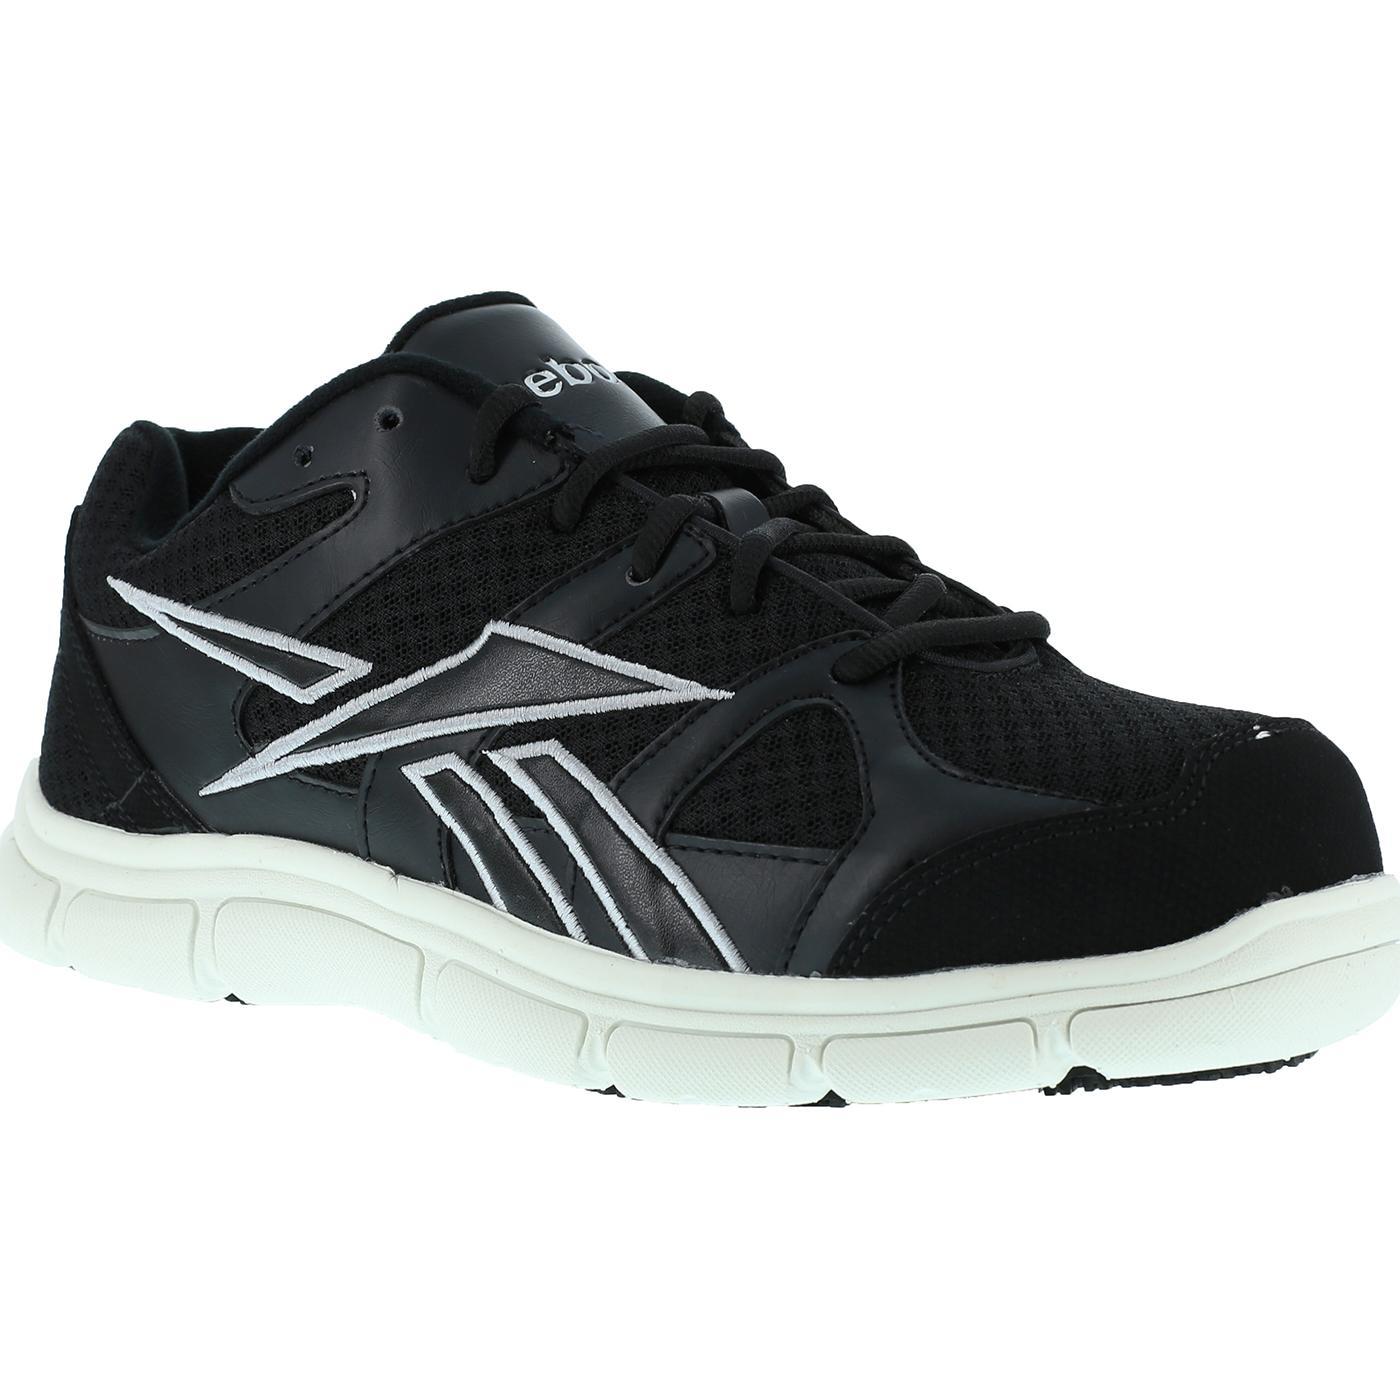 Womenu0026#39;s Composite Toe Slip-Resistant Athletic Shoe - Reebok